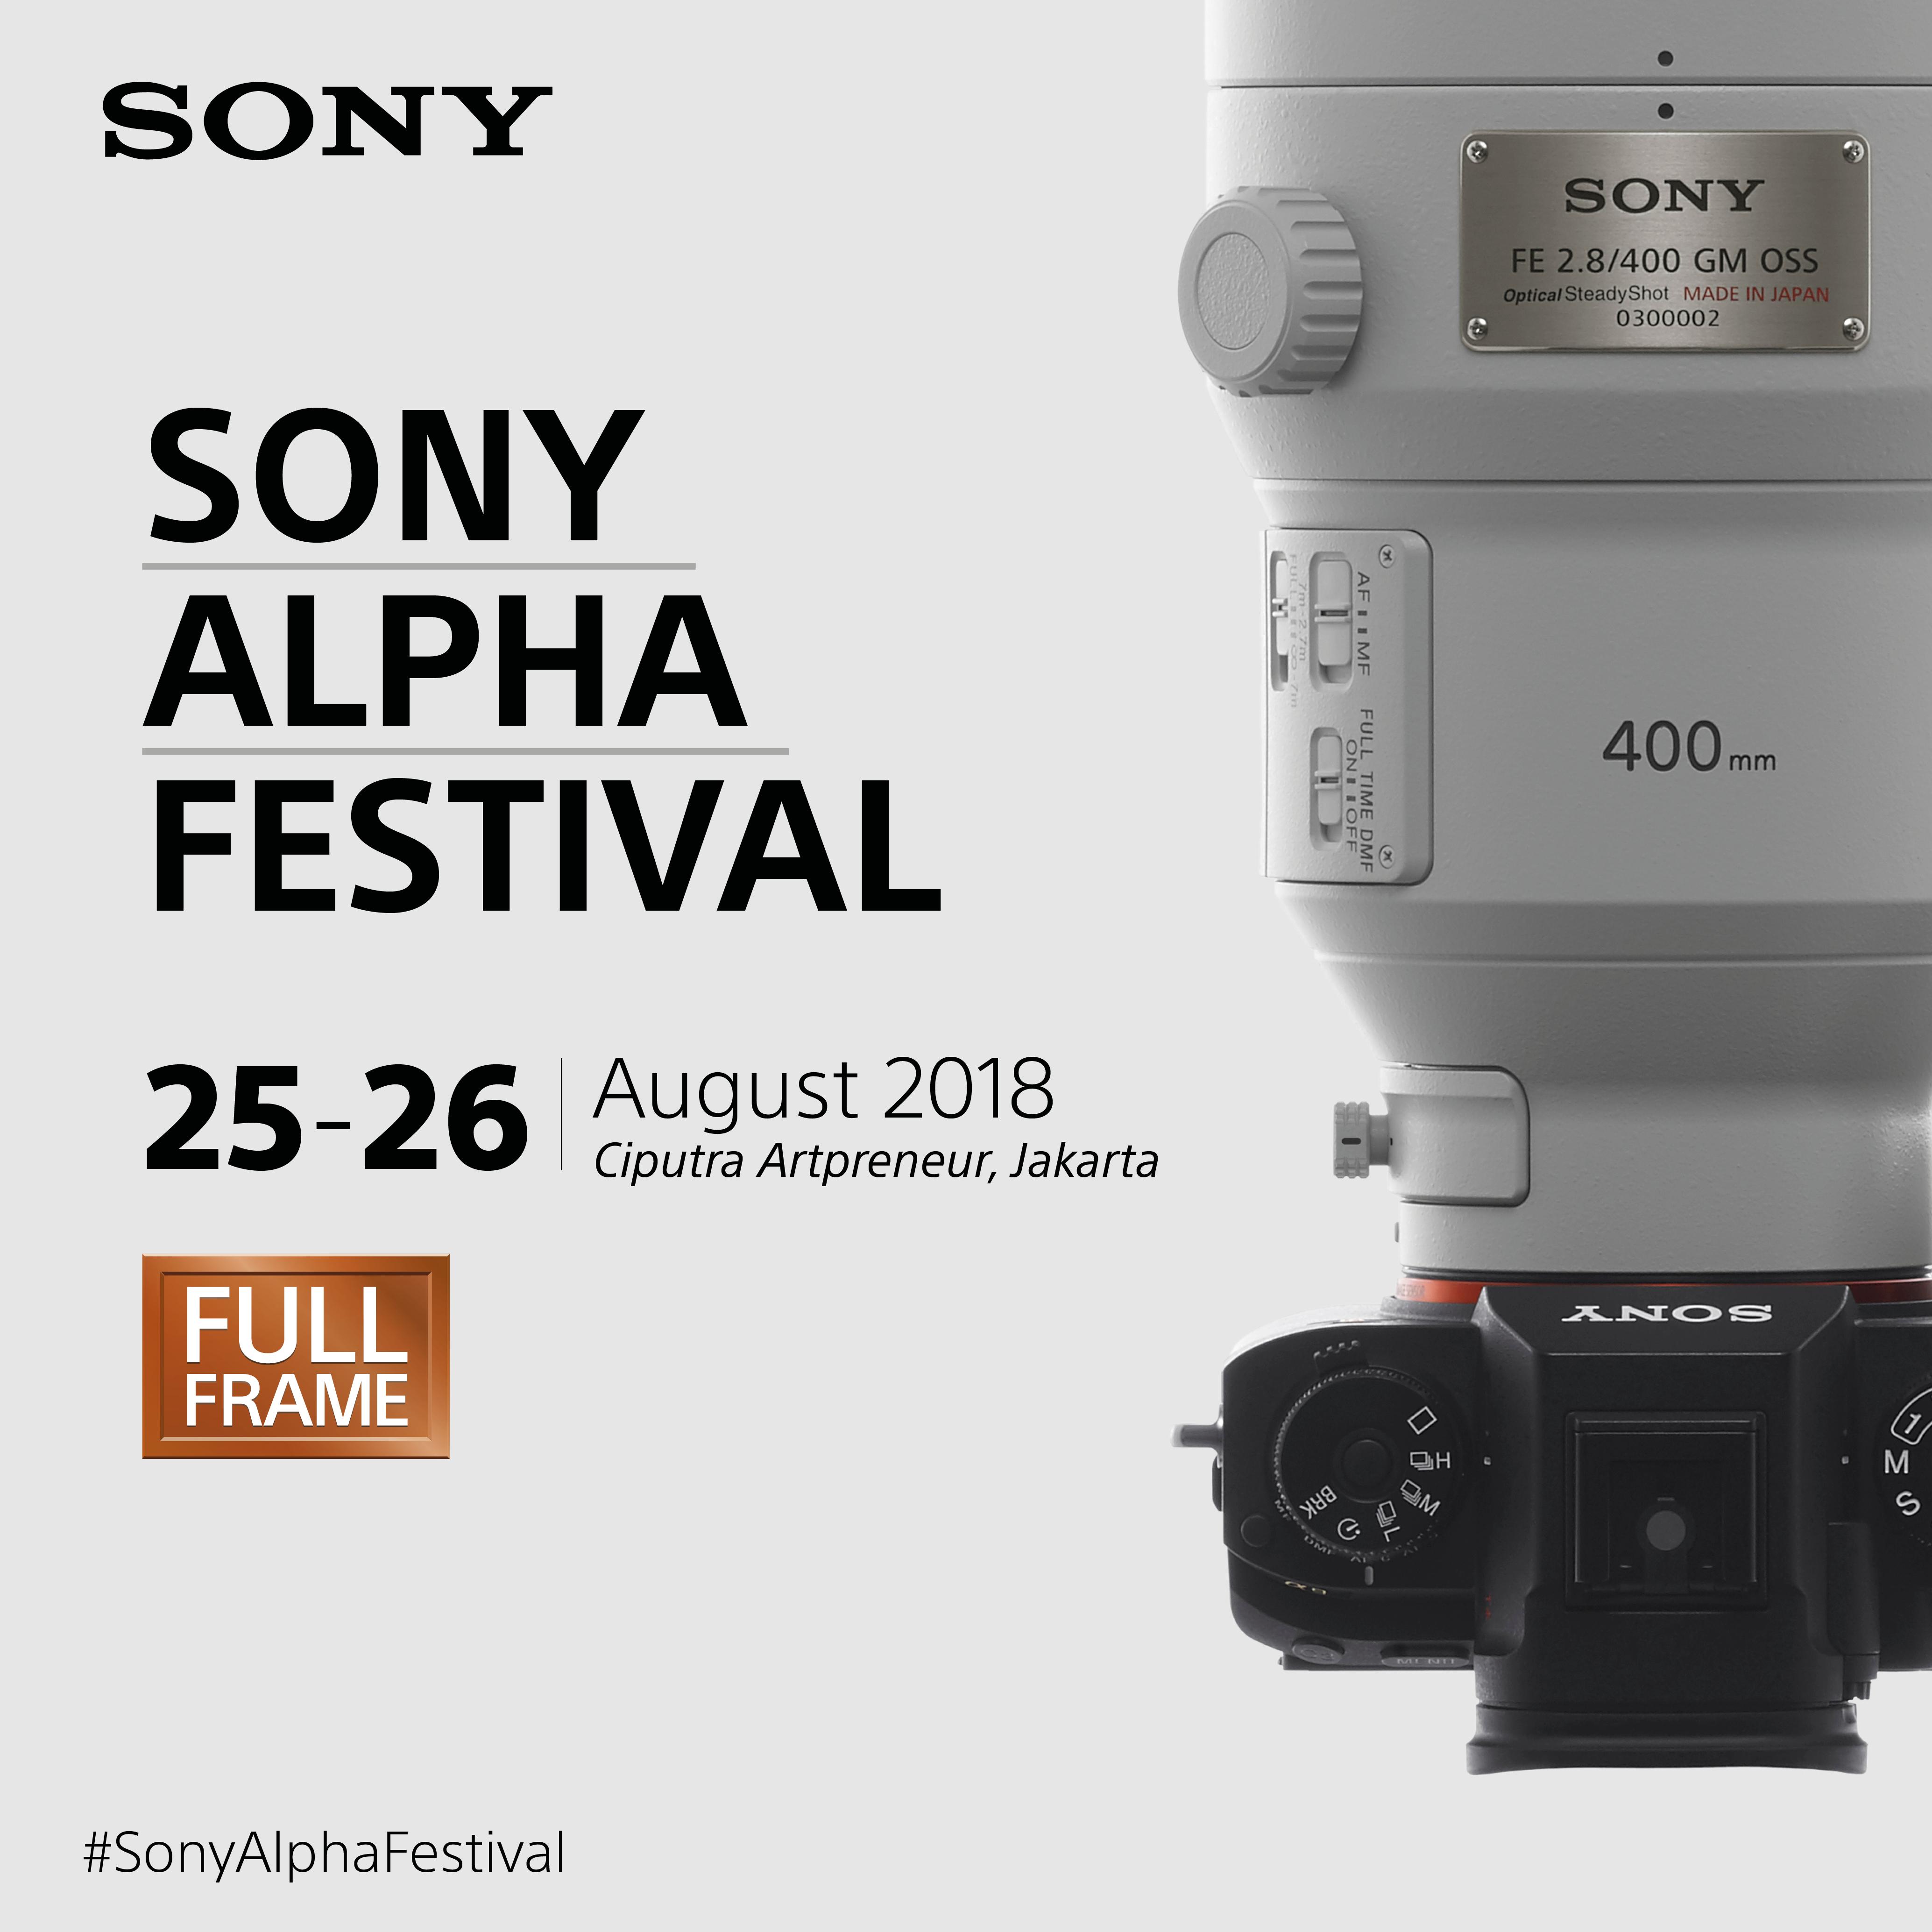 Sony Alpha Festival Menampilkan Rangkaian Produk Kamera Mirrorless Full-Frame Sony dan Memperkenalkan 400mm F2.8 G Master™ Prime Lens